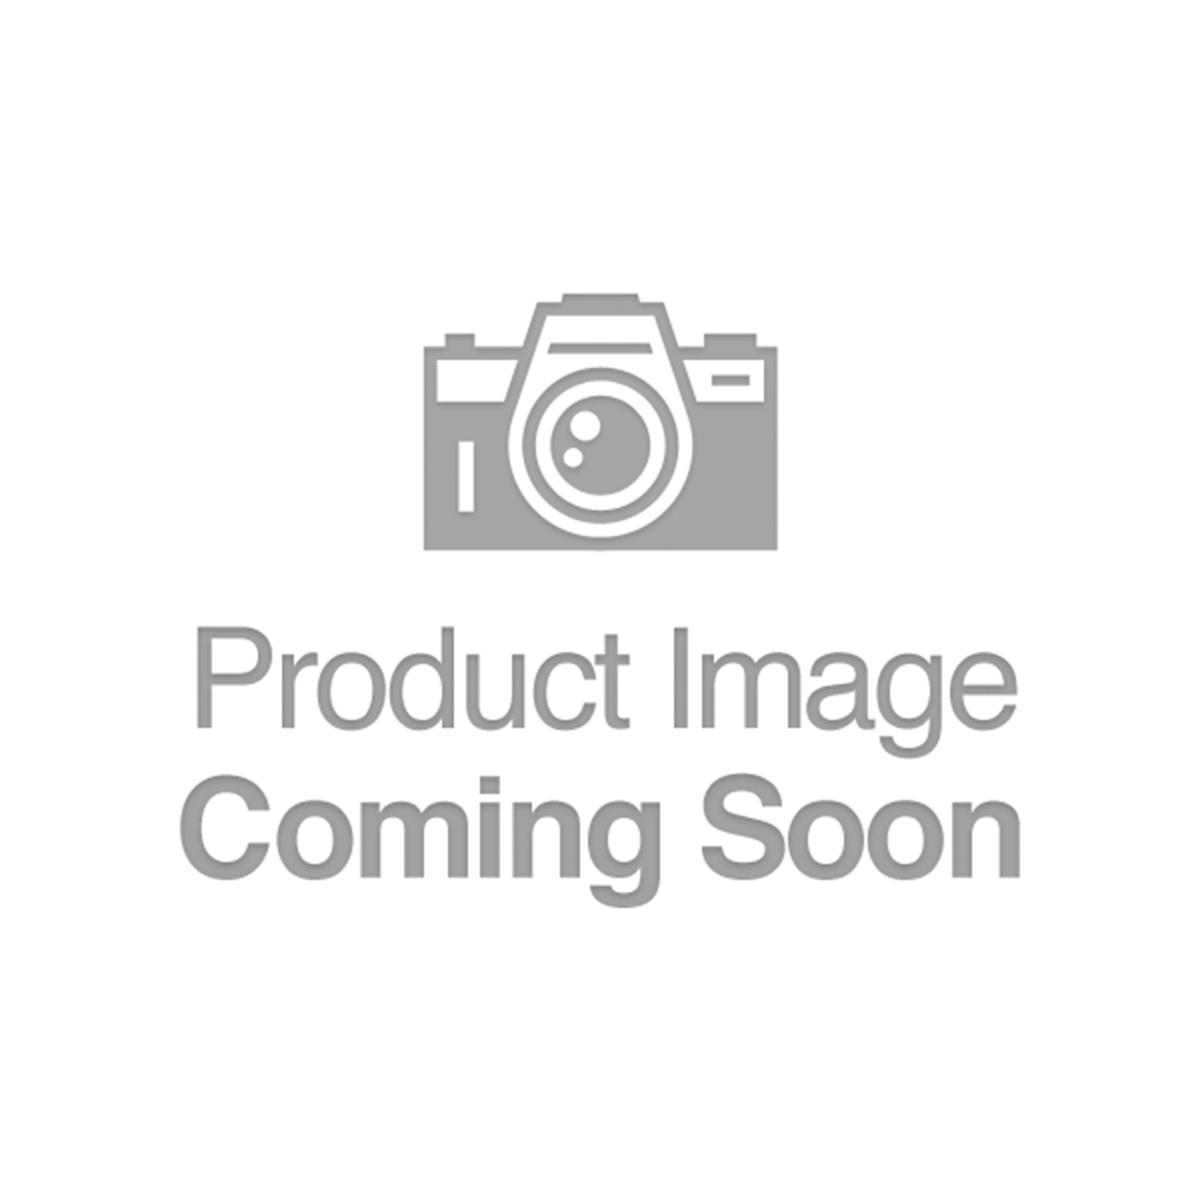 Dimes | Kagin's Inc  TMG com